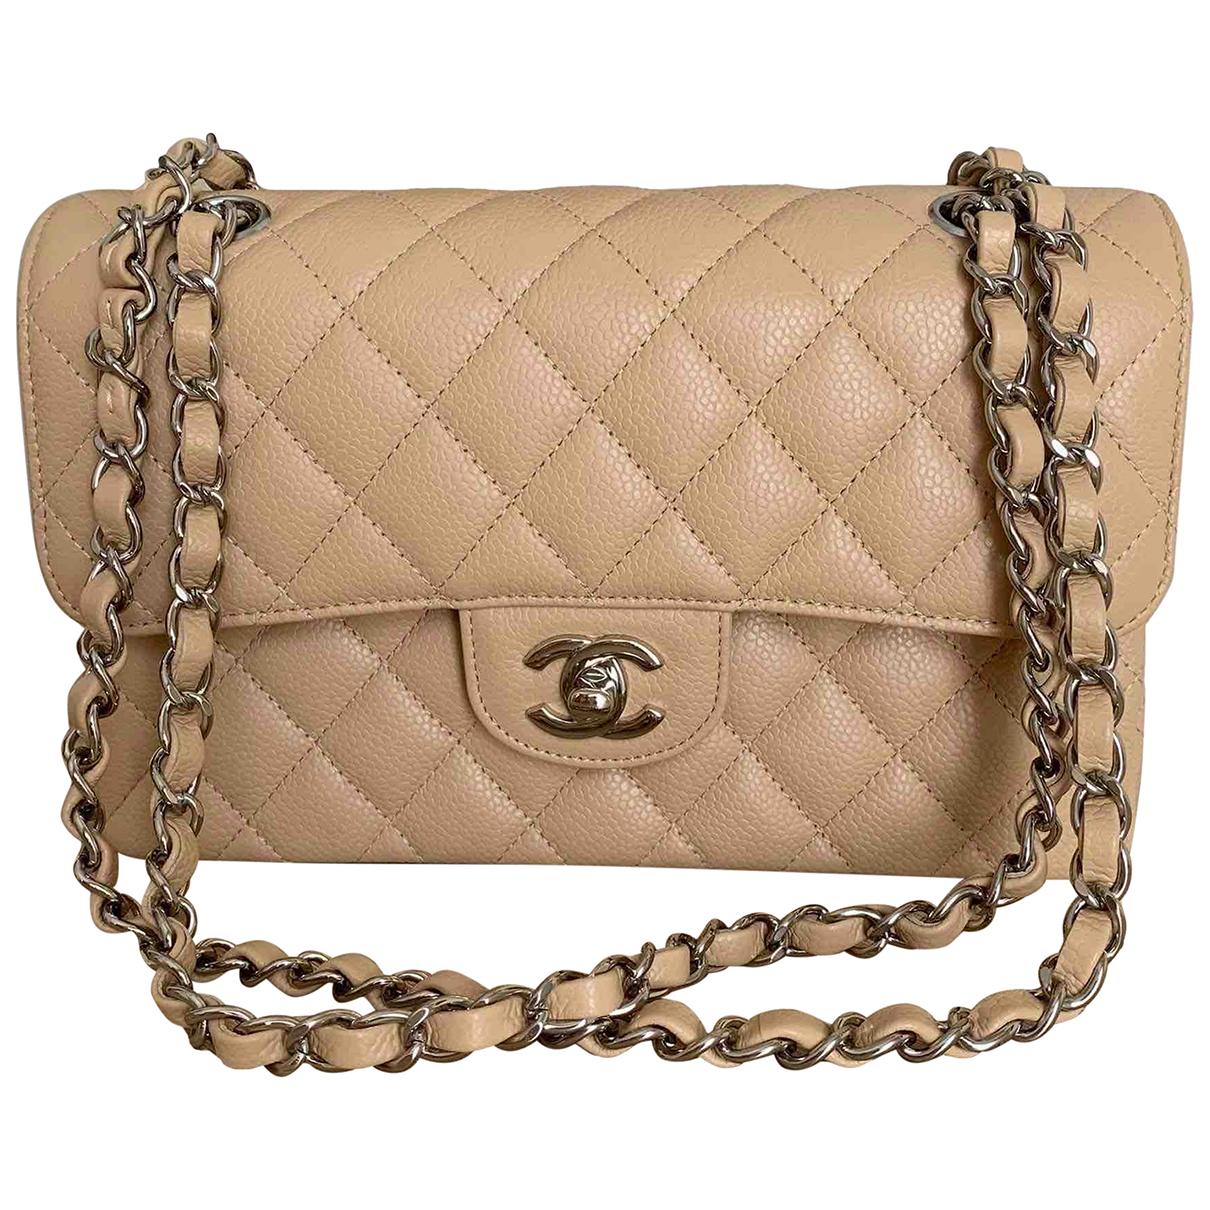 Chanel Timeless/Classique Handtasche in  Beige Leder